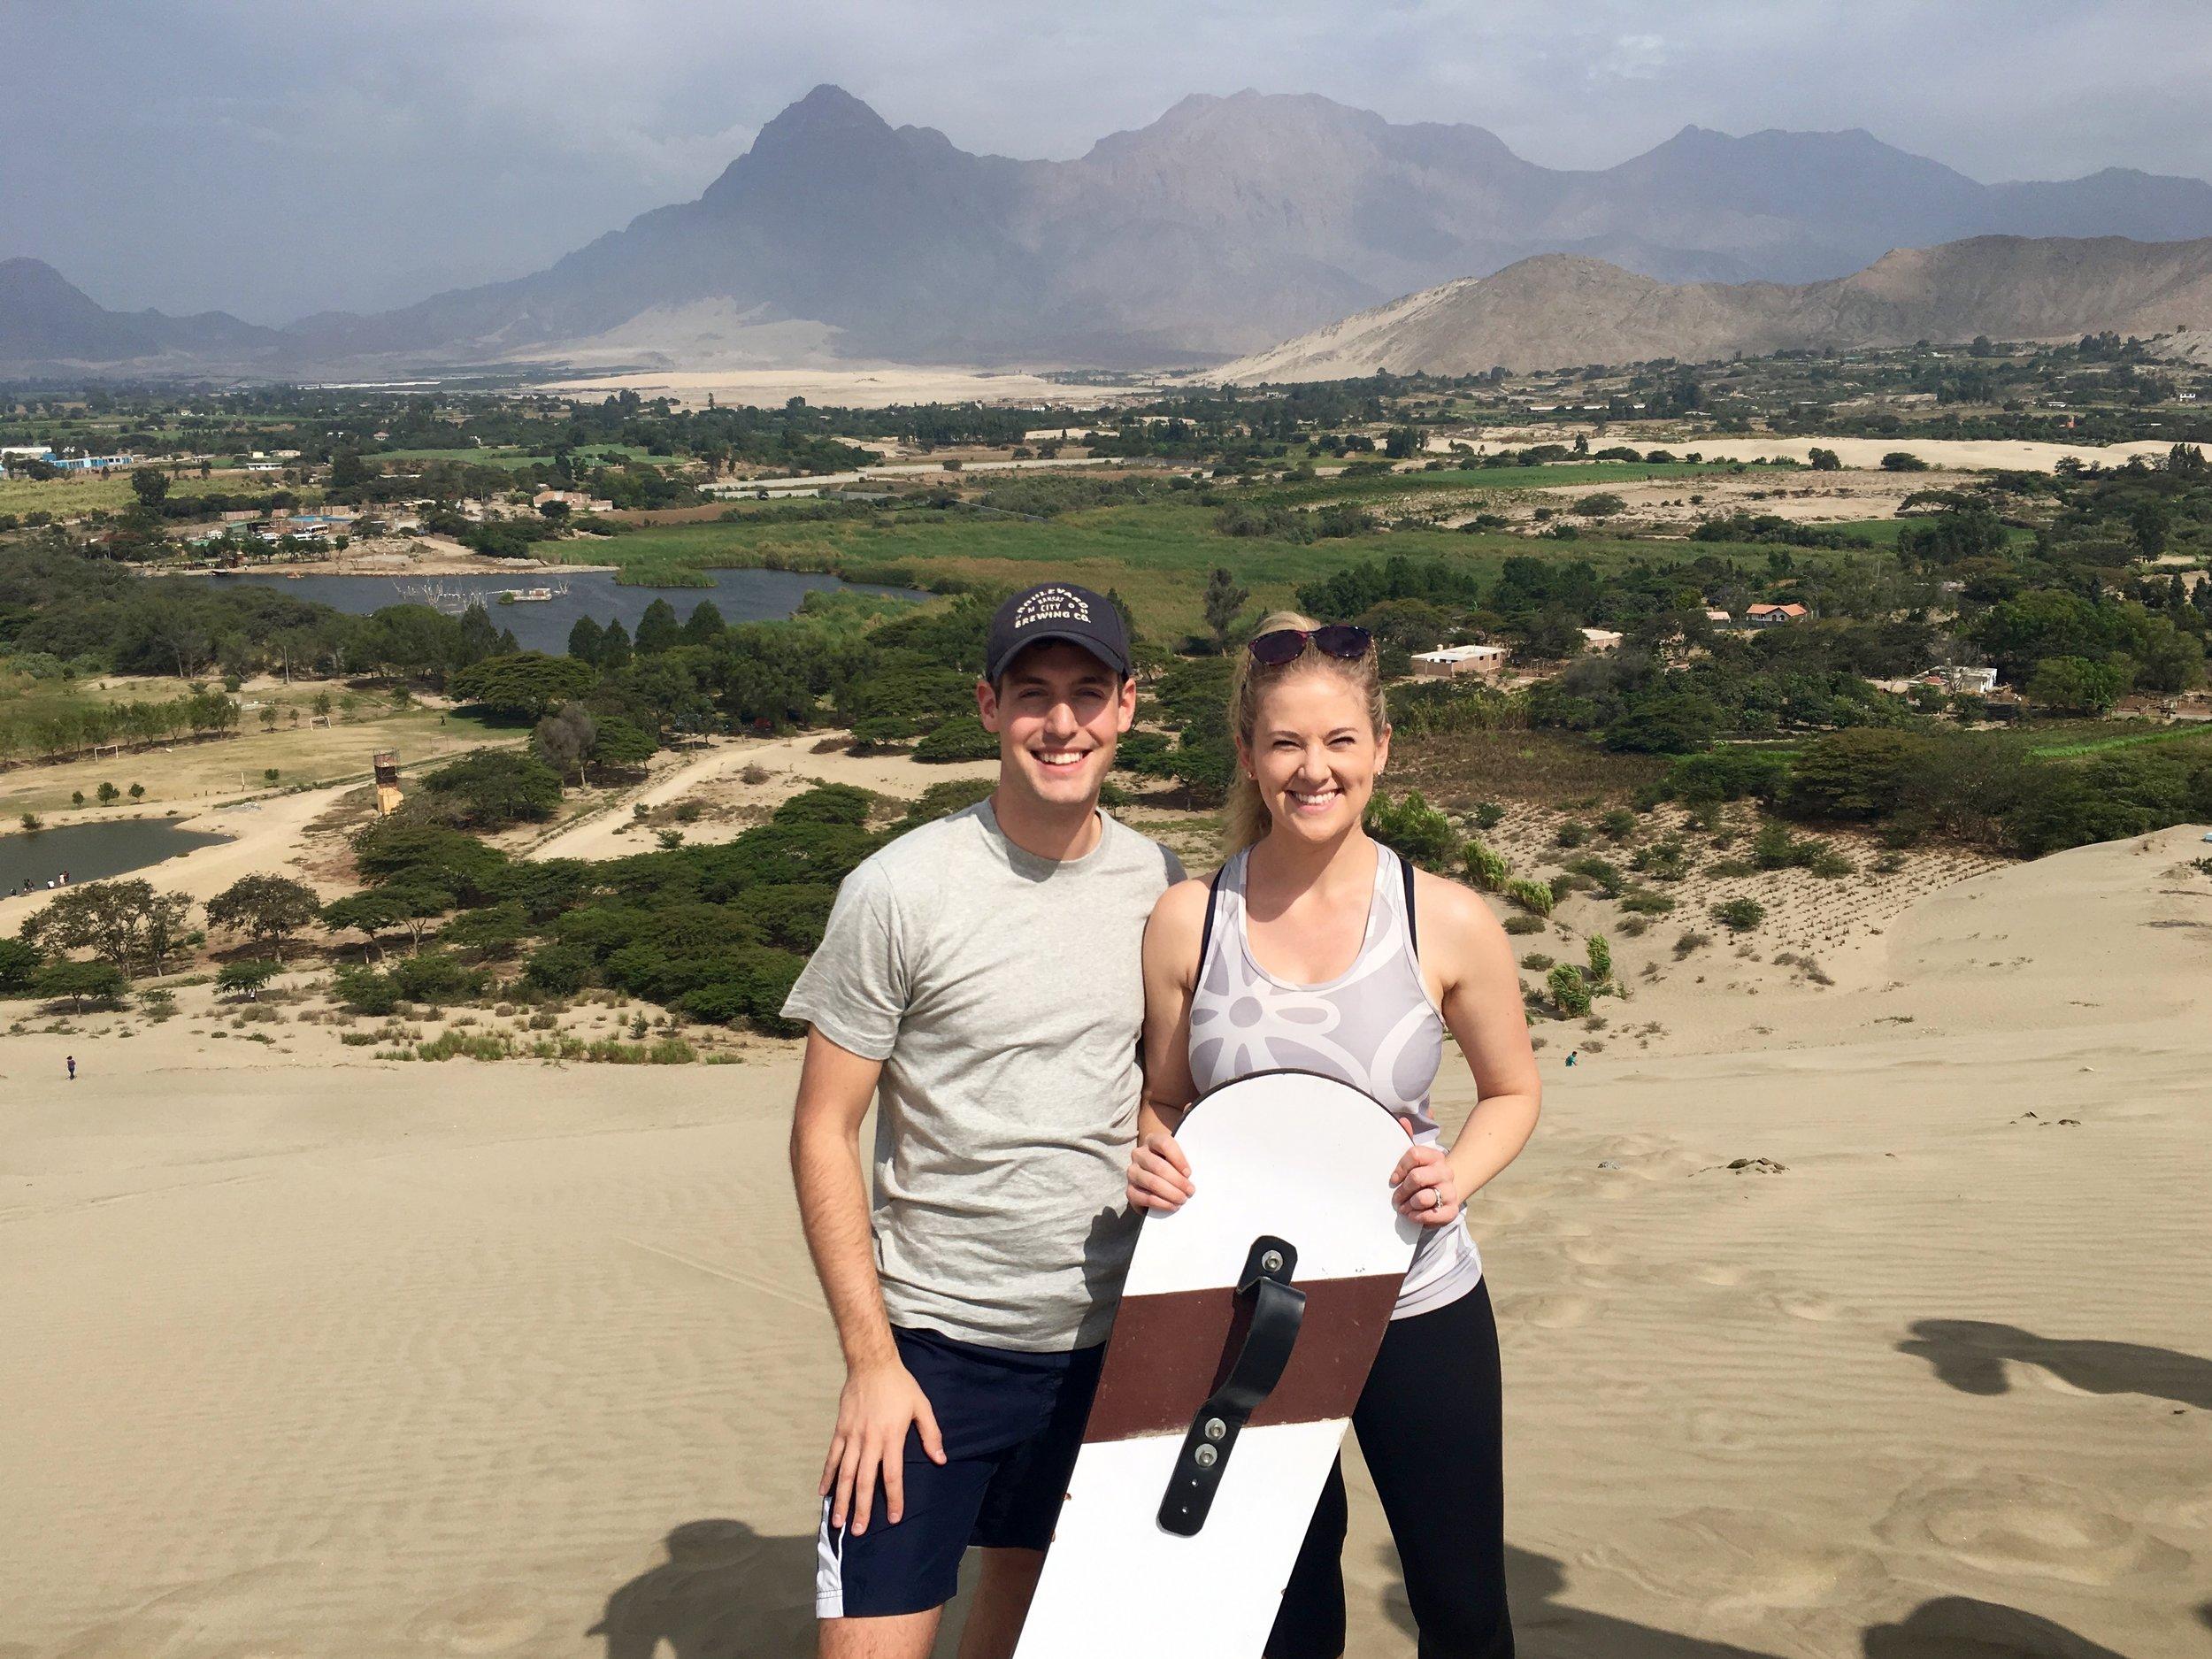 Sandboarding the Conache sand dunes